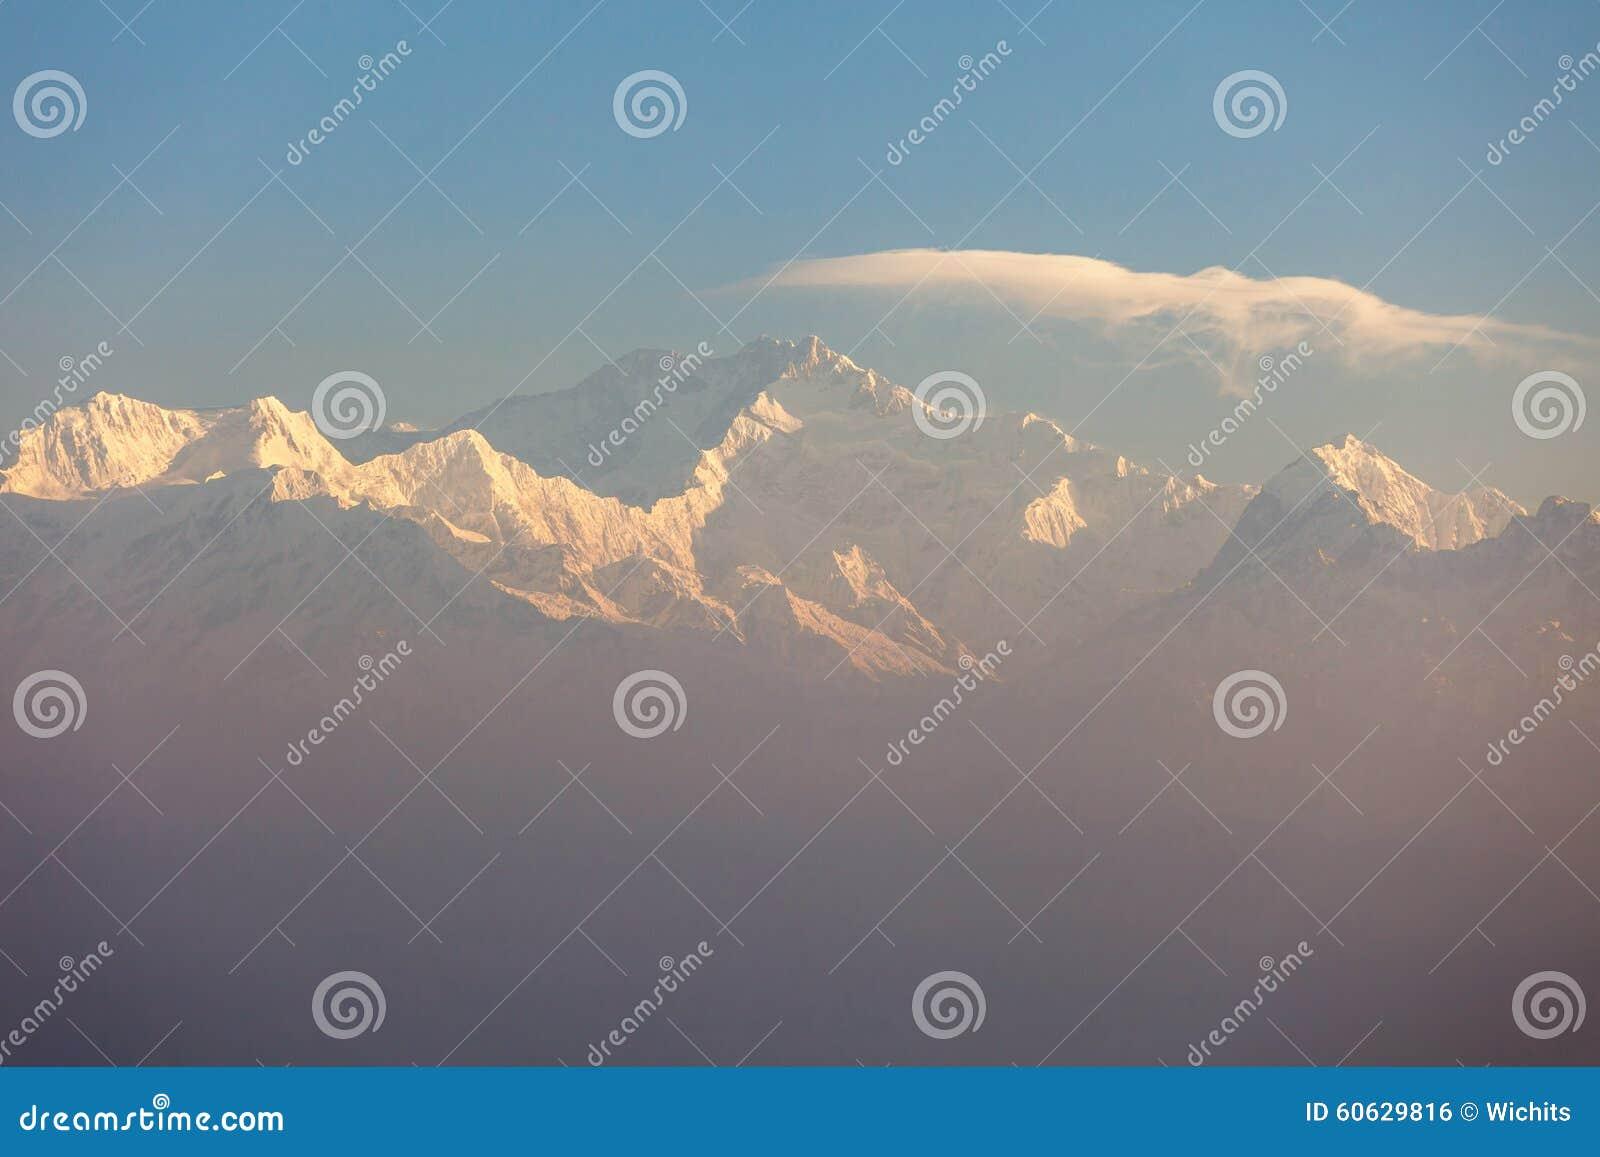 Download Khangchendzonga range peak stock photo. Image of park - 60629816